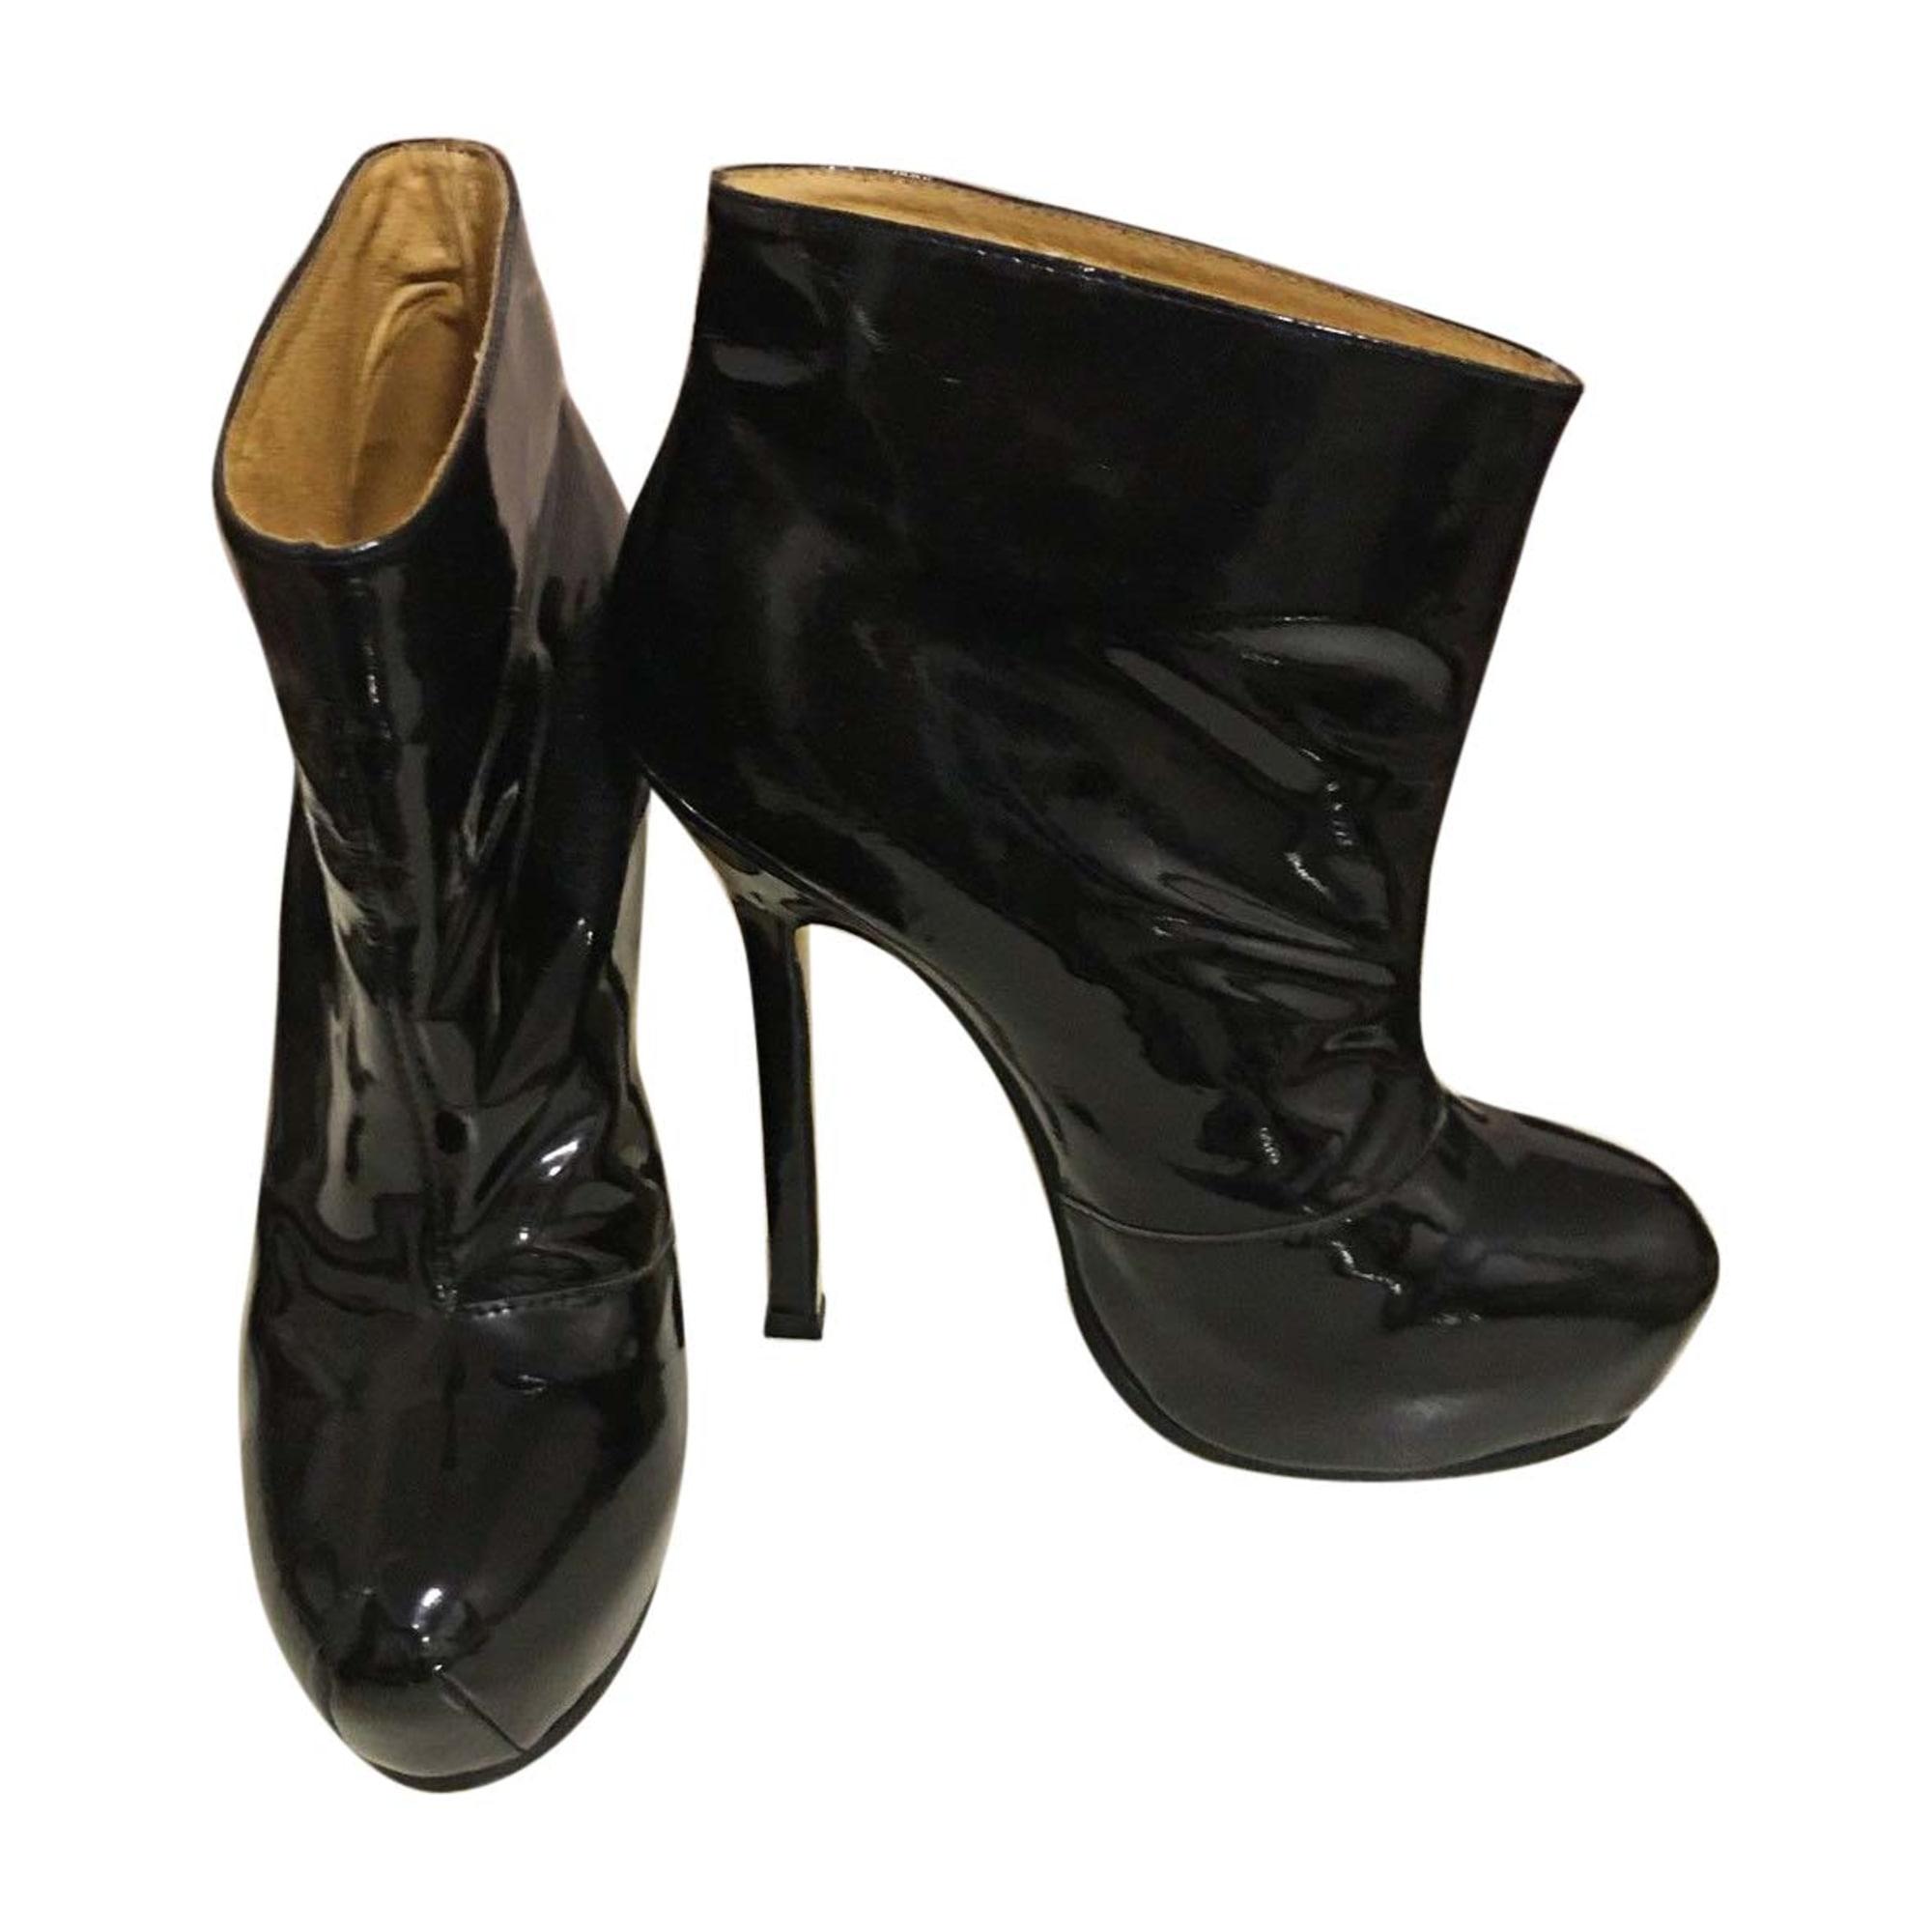 8b61a60caa9 High Heel Ankle Boots YVES SAINT LAURENT